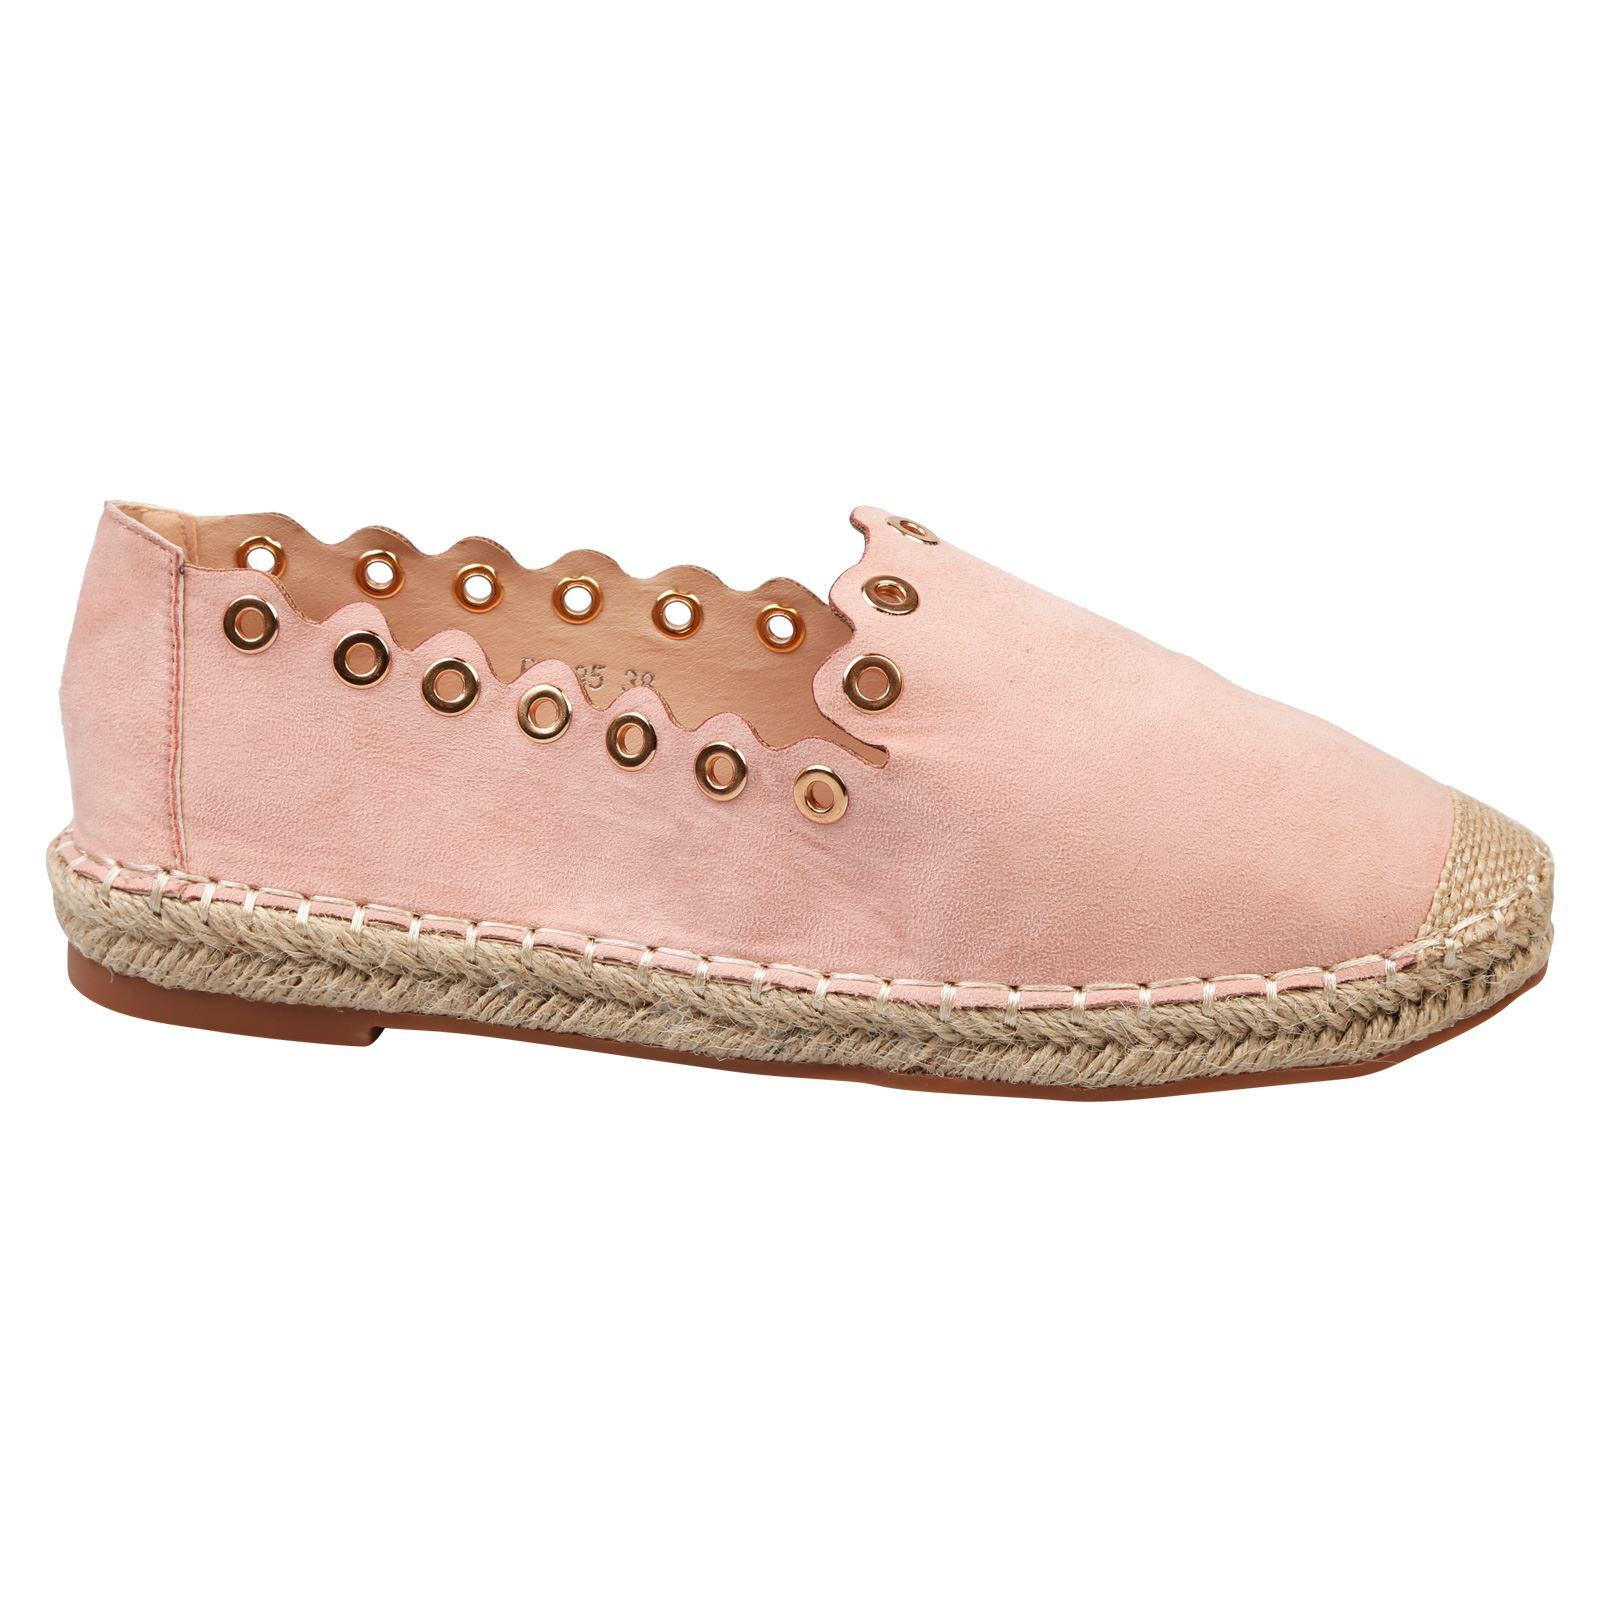 6235972e9f7 Ursula Womens Flats Low HEELS Slip on Espadrilles Ladies Shoes PUMPS ...